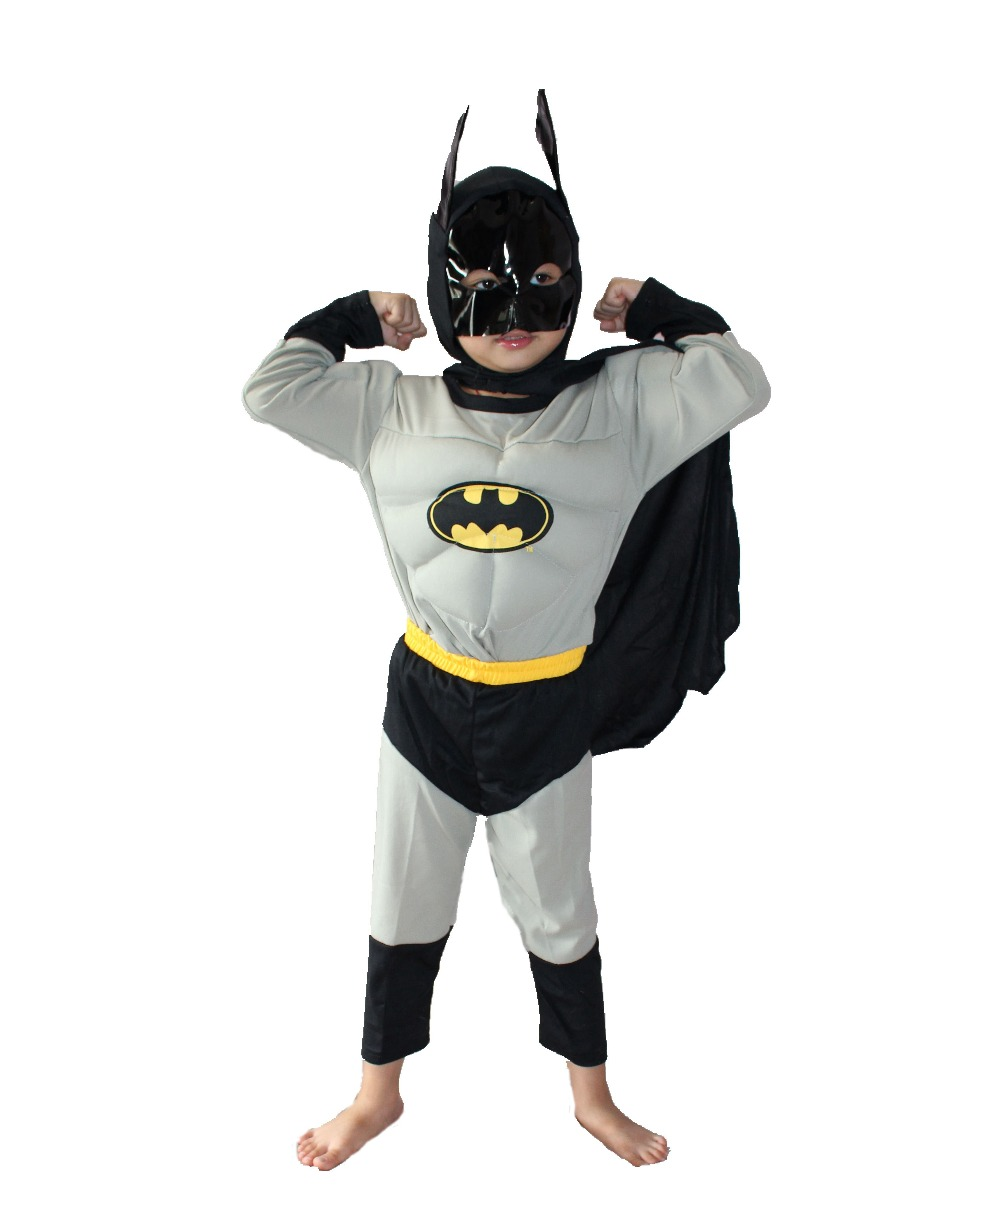 Medium Crop Of Batman Halloween Costume